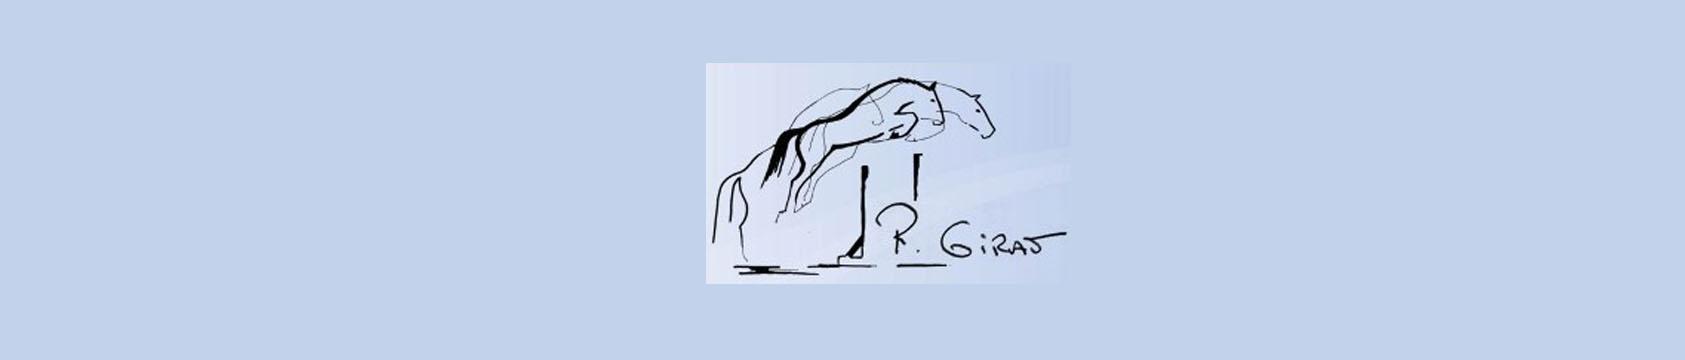 roberte-girao-sportpferde